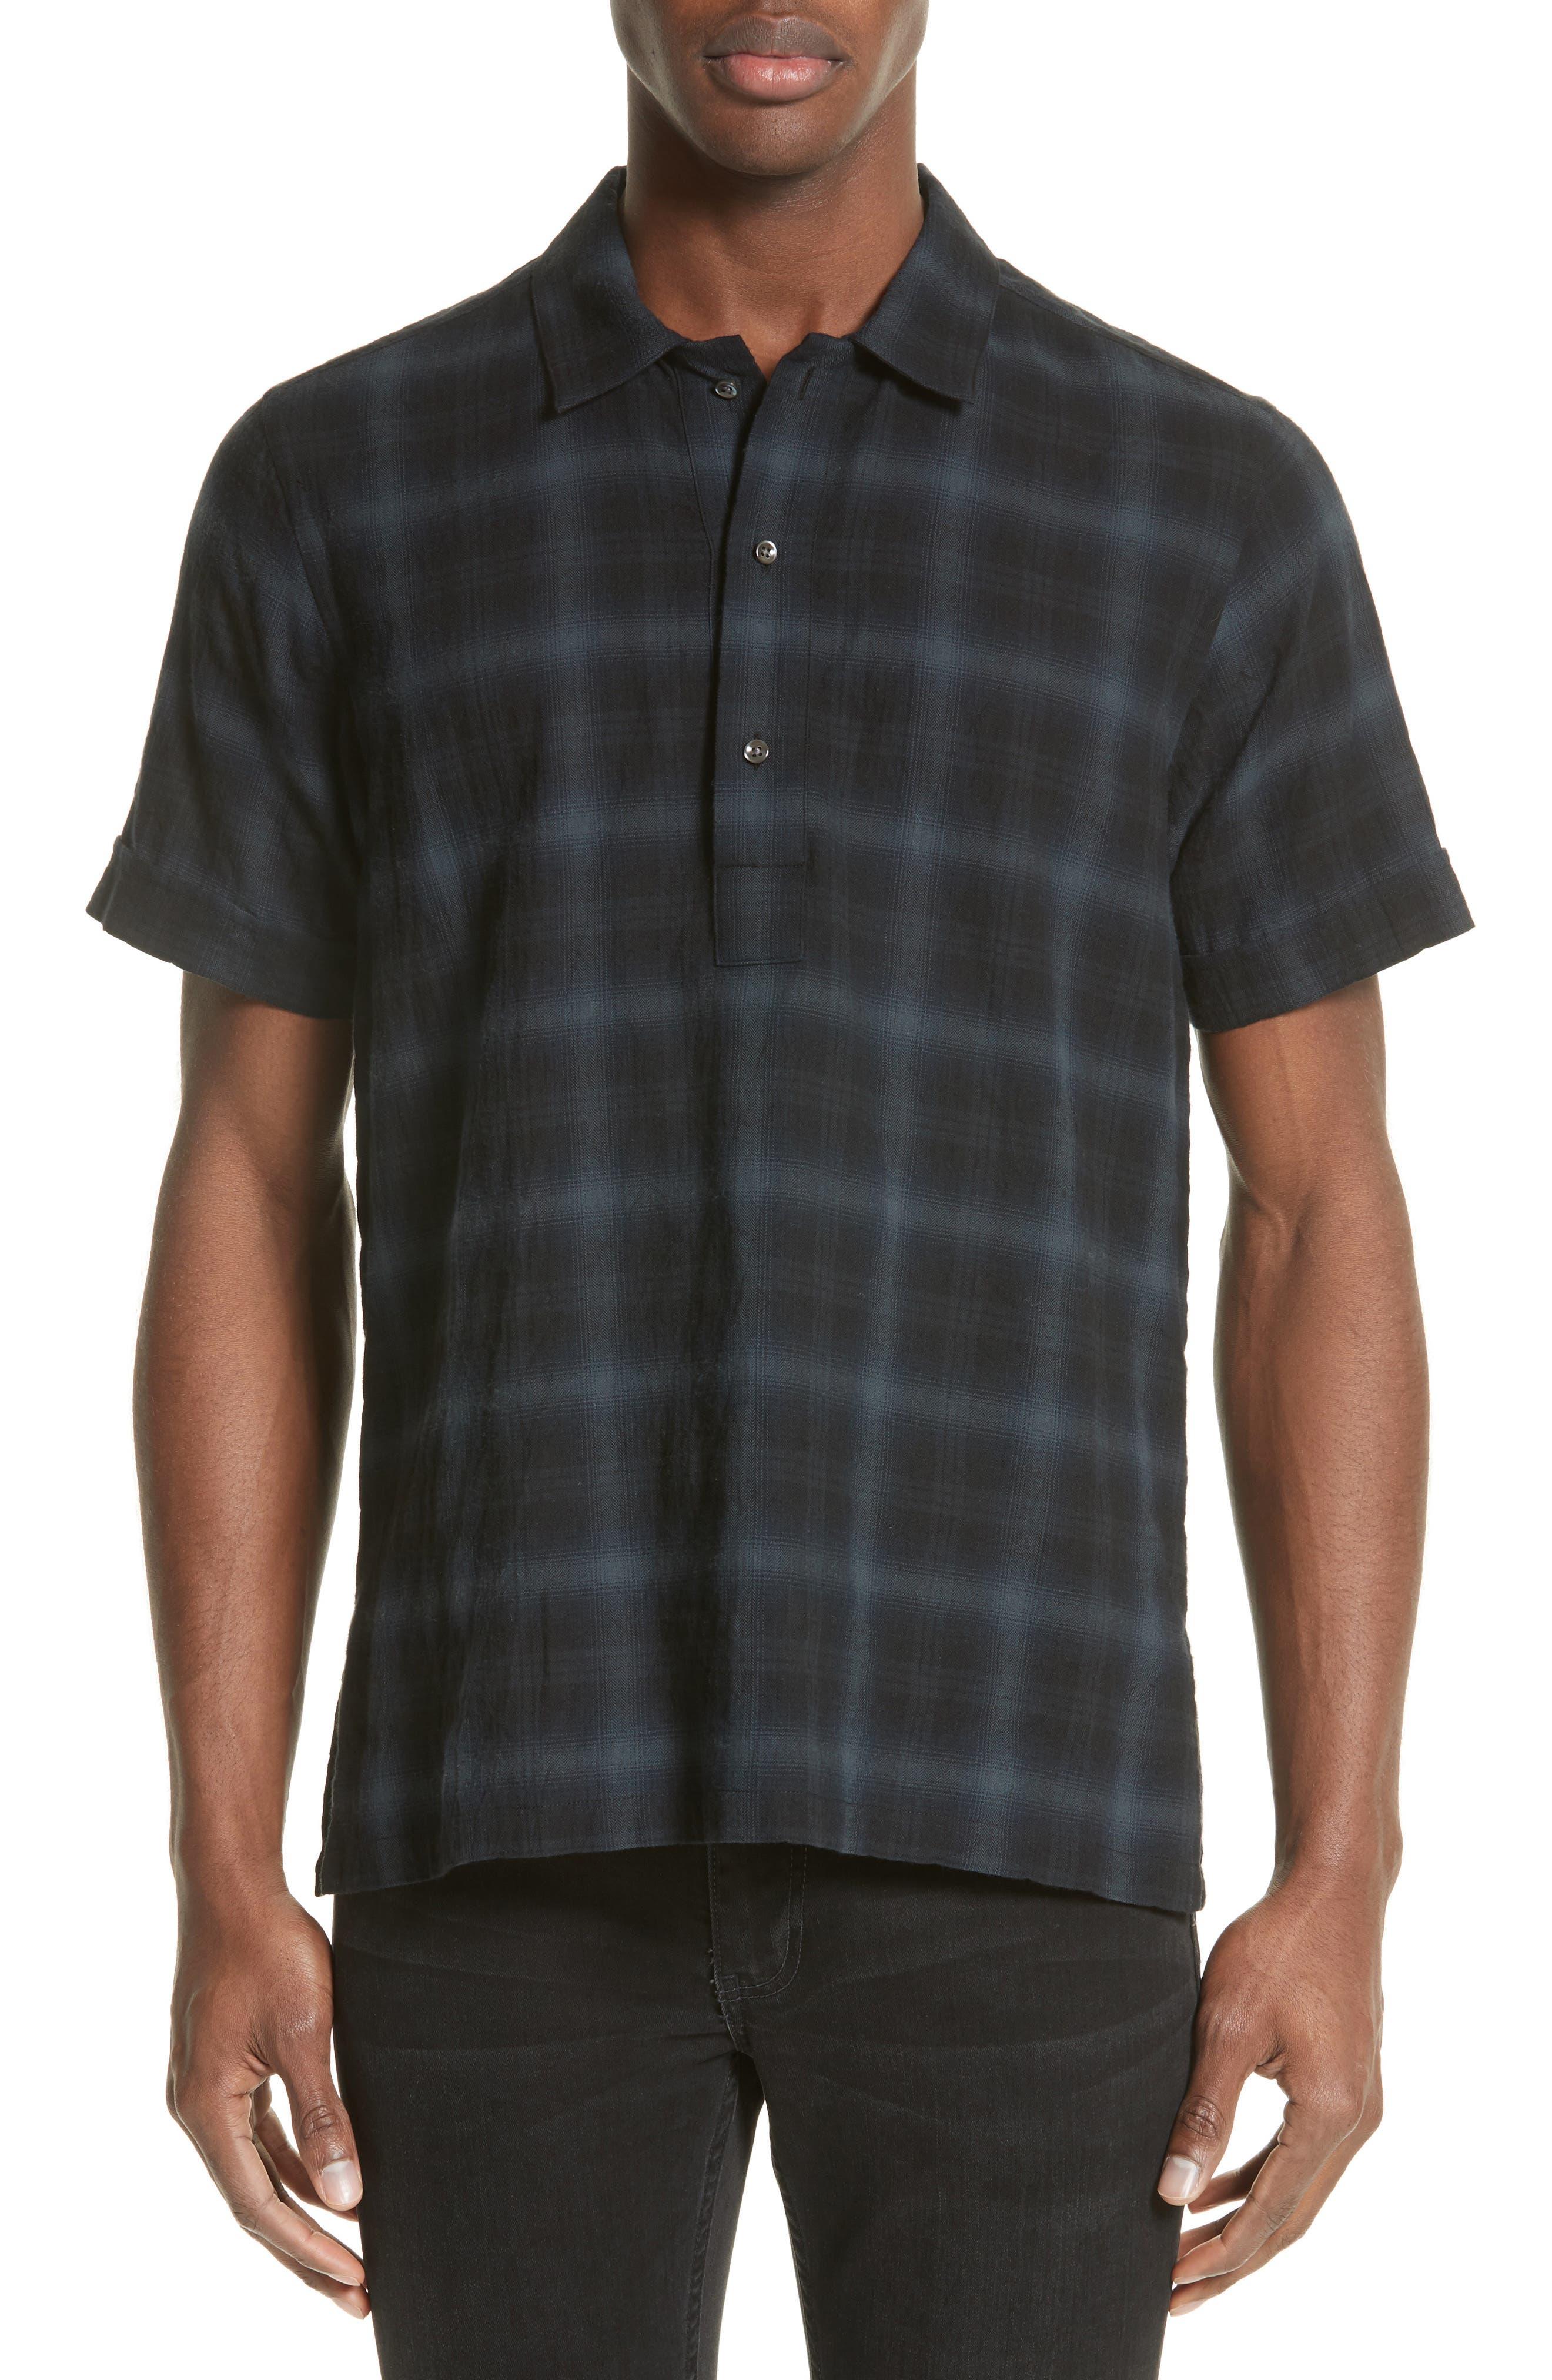 Alternate Image 1 Selected - OVADIA & SONS Ashkelon Polo Shirt